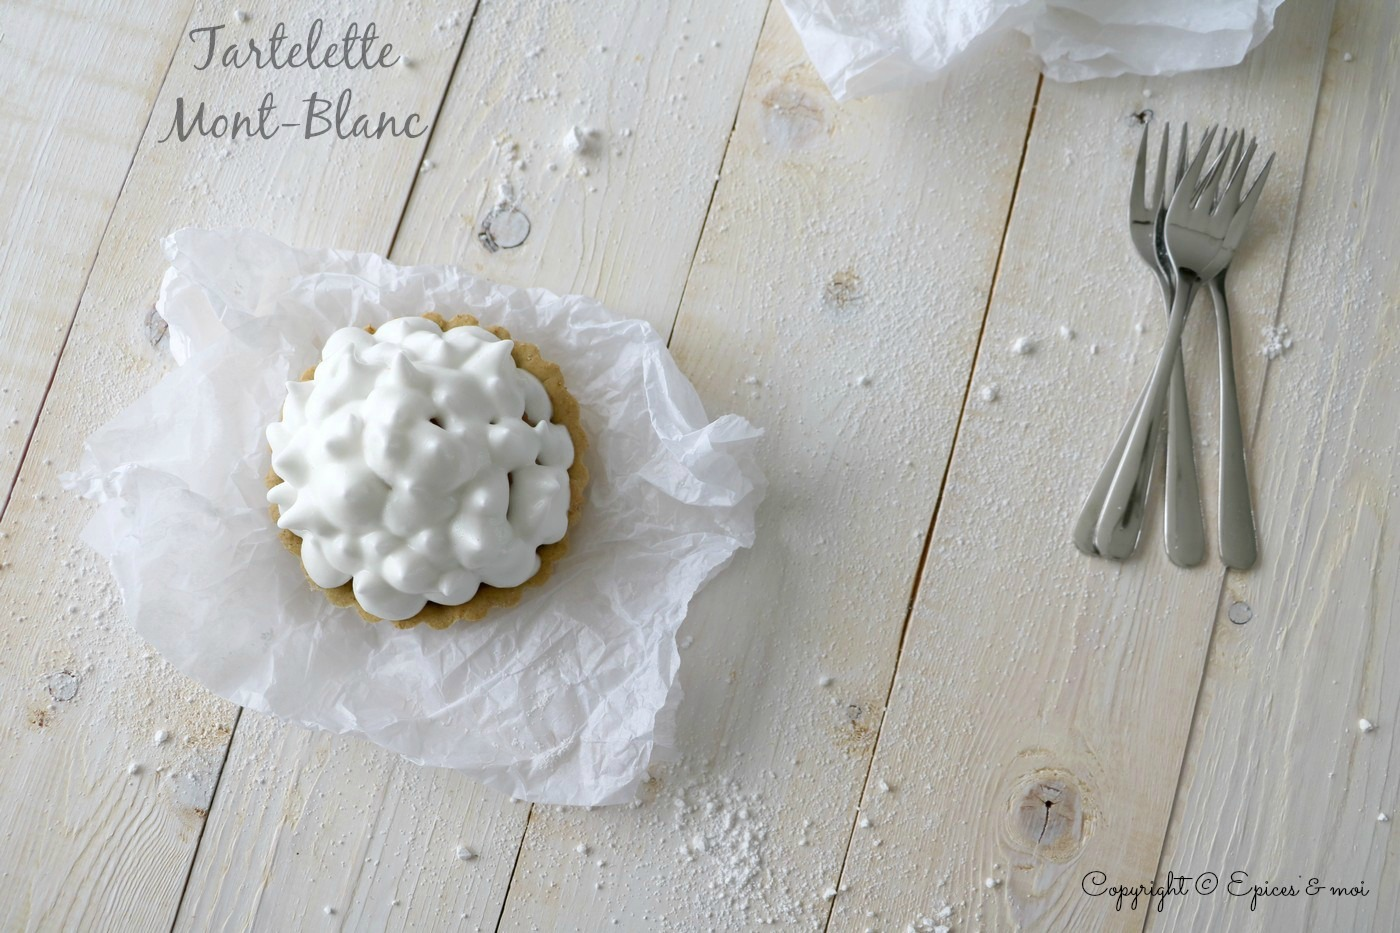 Epices & moi Tartelettes Mont Blanc 2